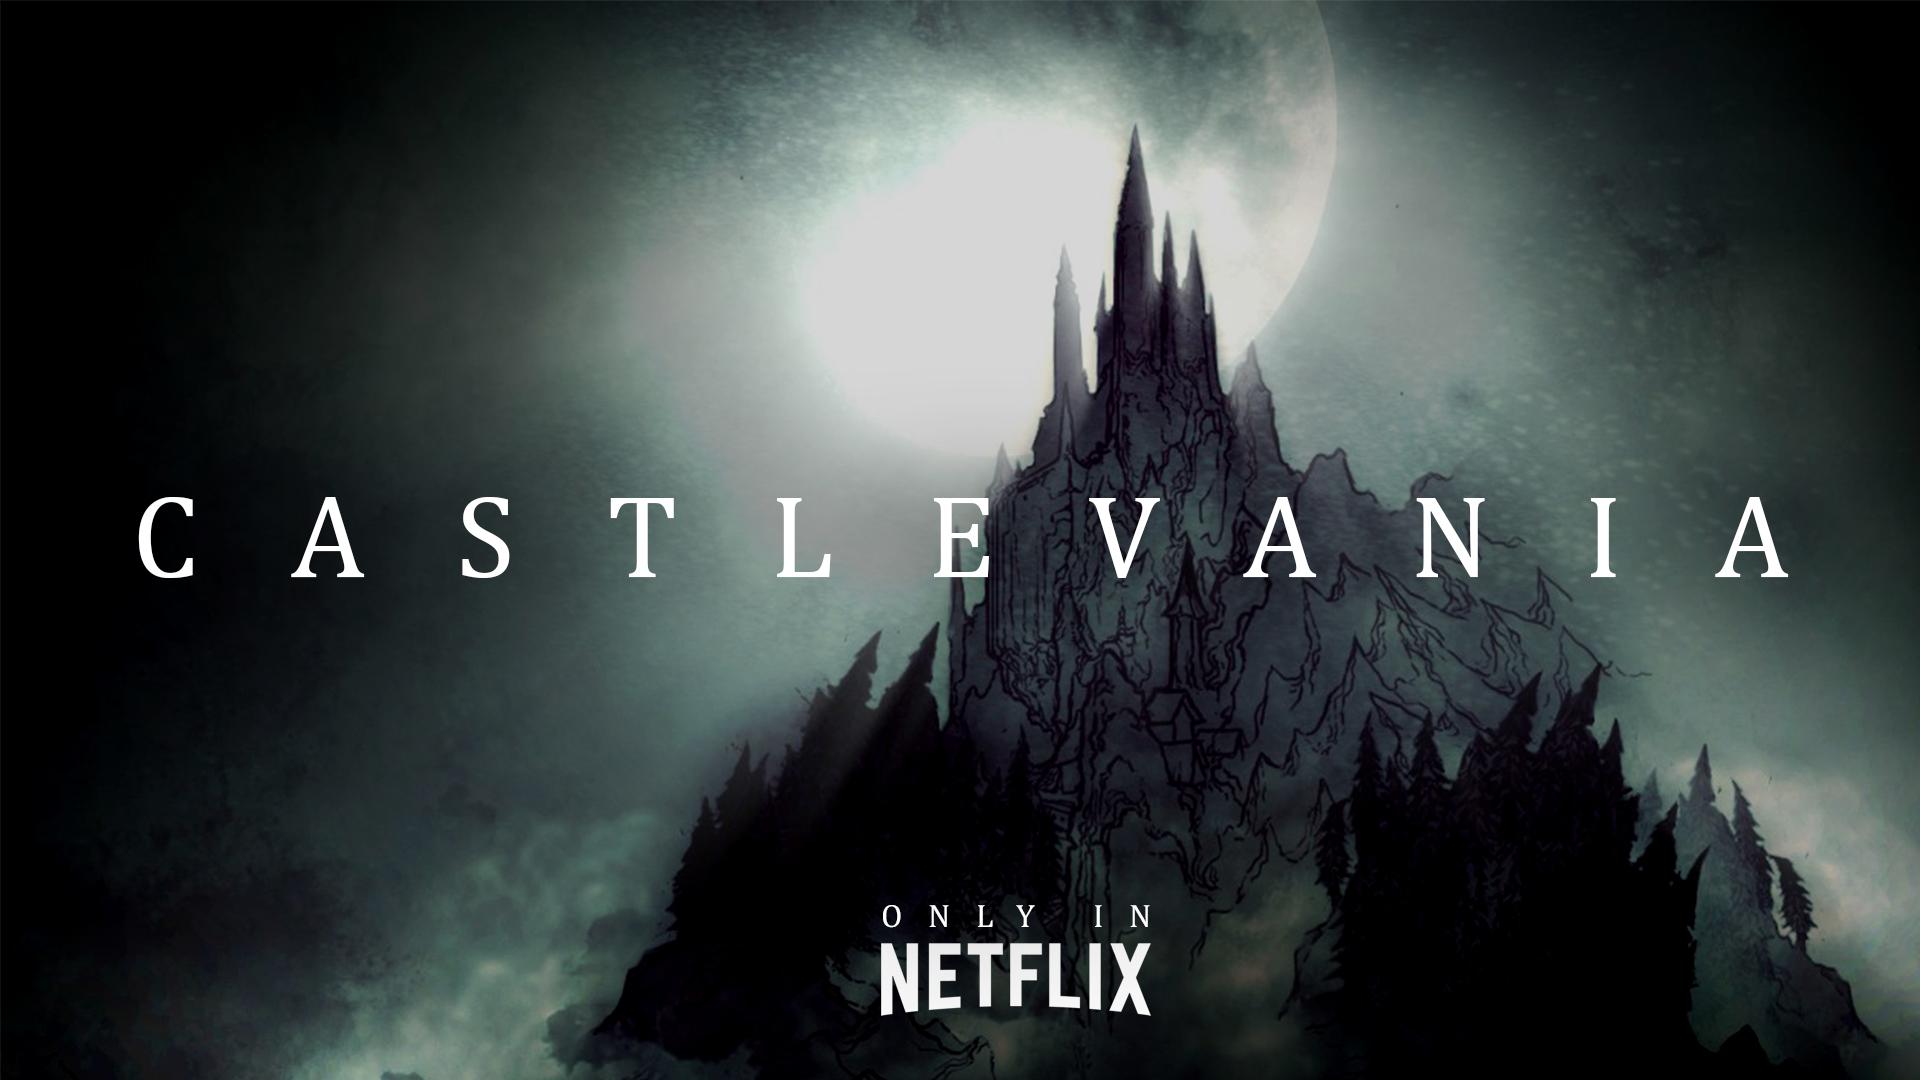 poster castlevania netflix